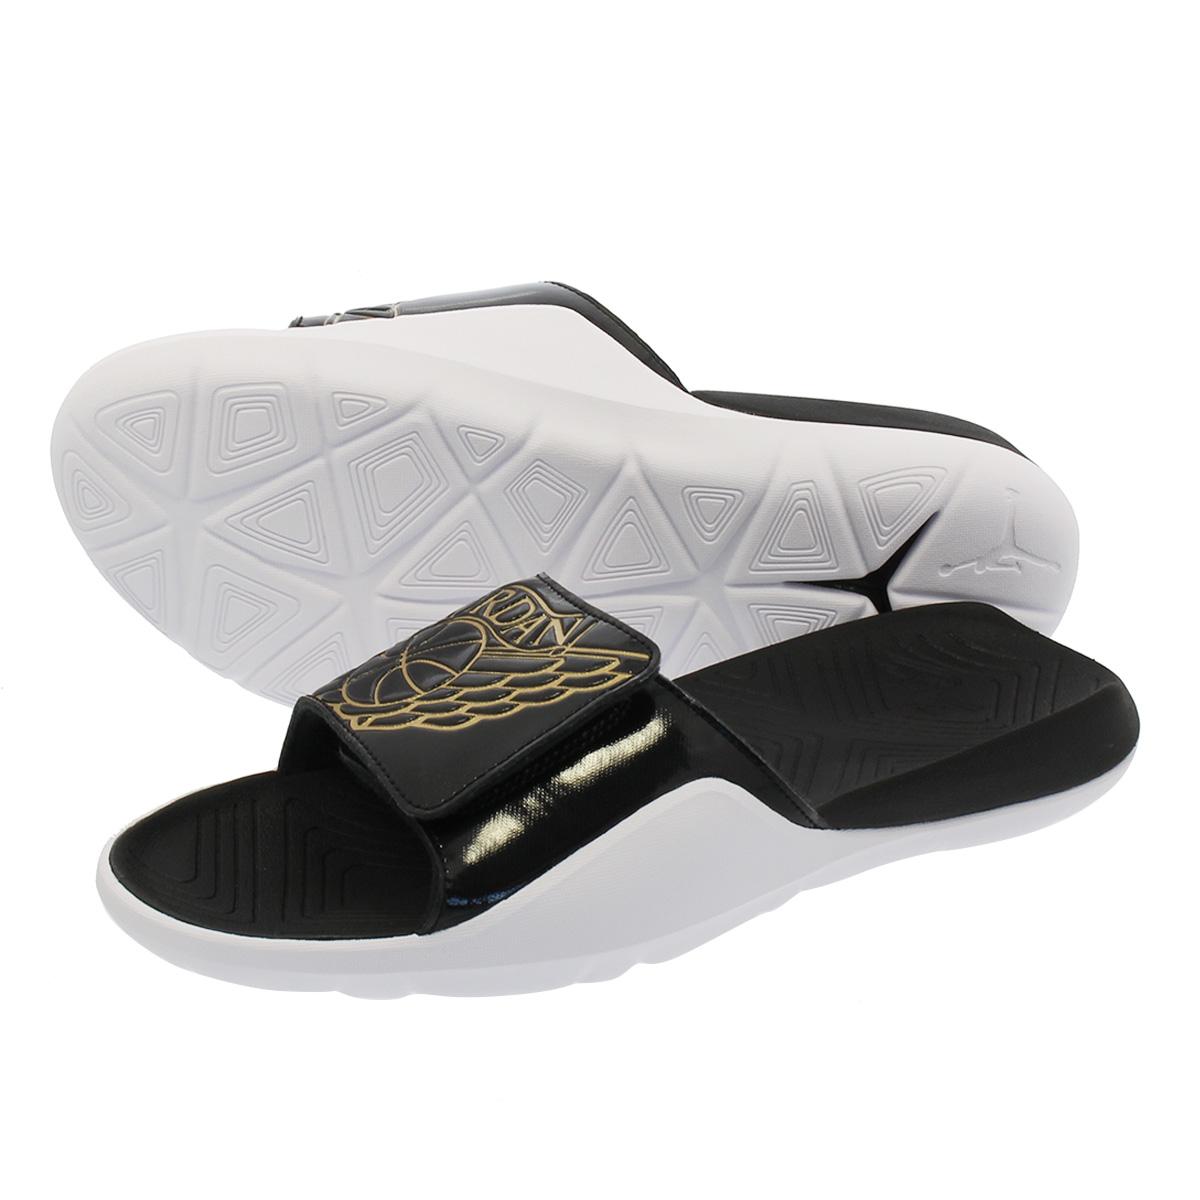 cheap for discount 3799d d28a7 LOWTEX PLUS: NIKE JORDAN HYDRO 7 Nike Jordan high mud 7 ...